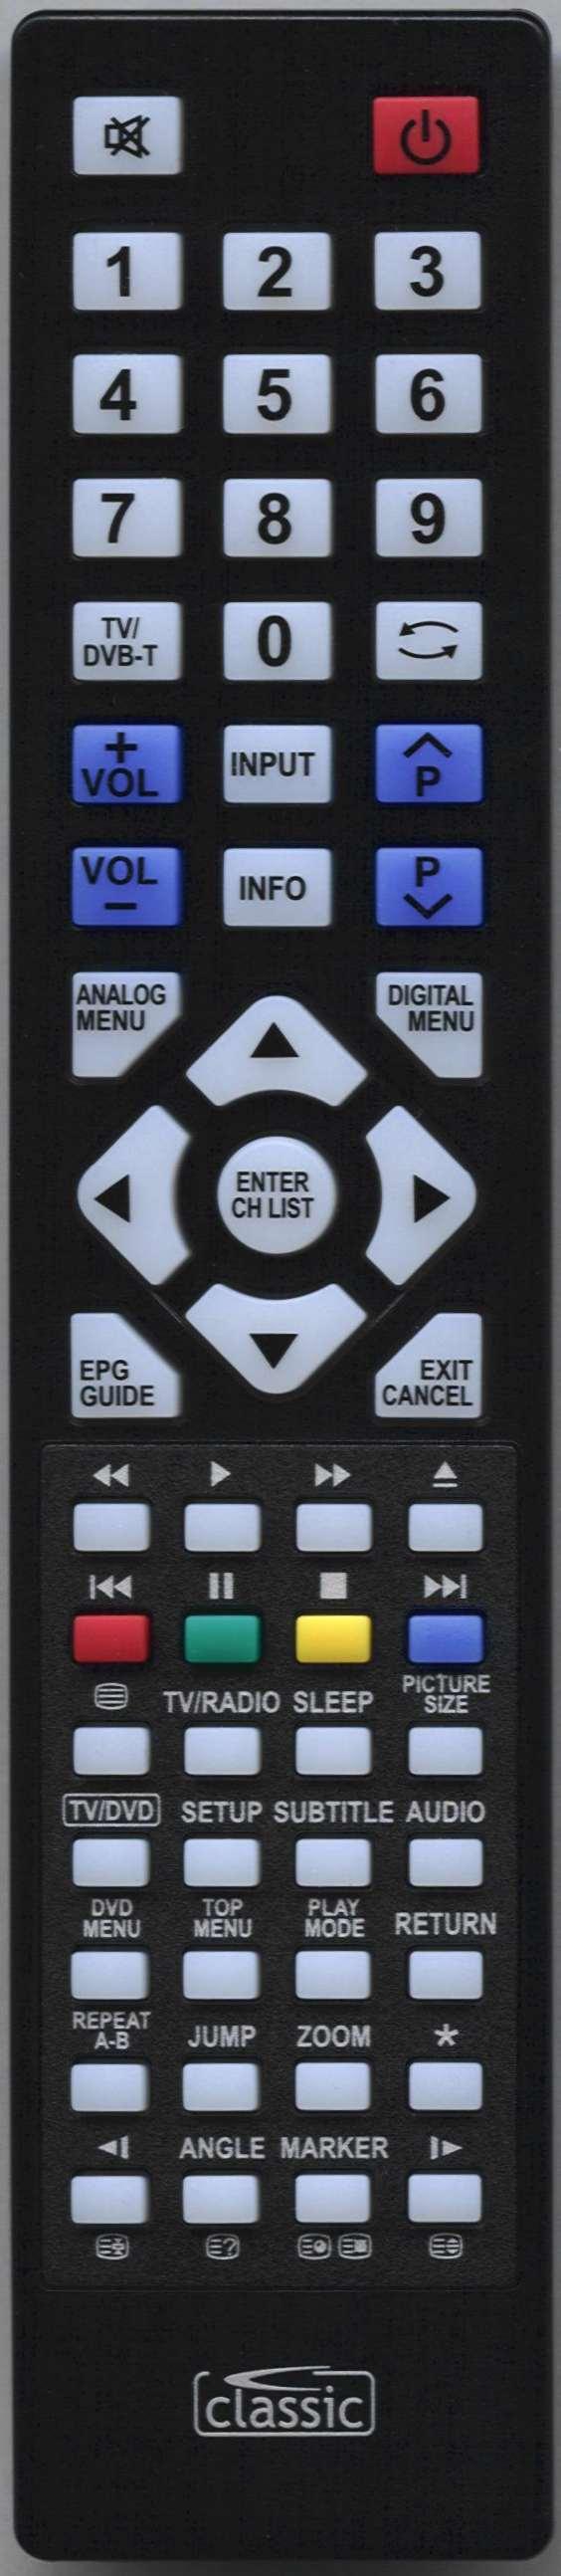 ORION TV19PL145DVD Remote Control